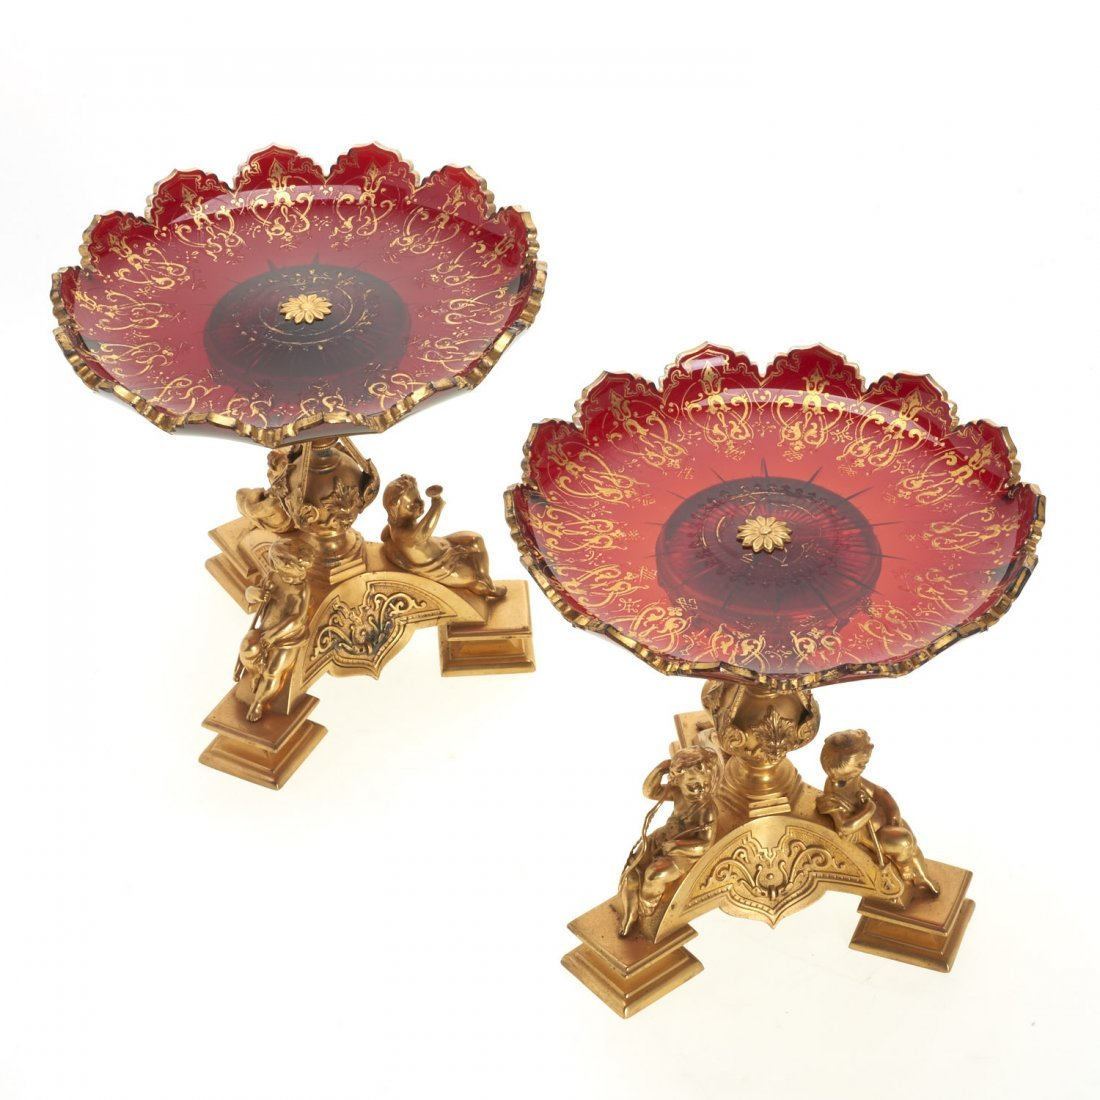 Pr Napoleon III style gilt bronze and glass tazze